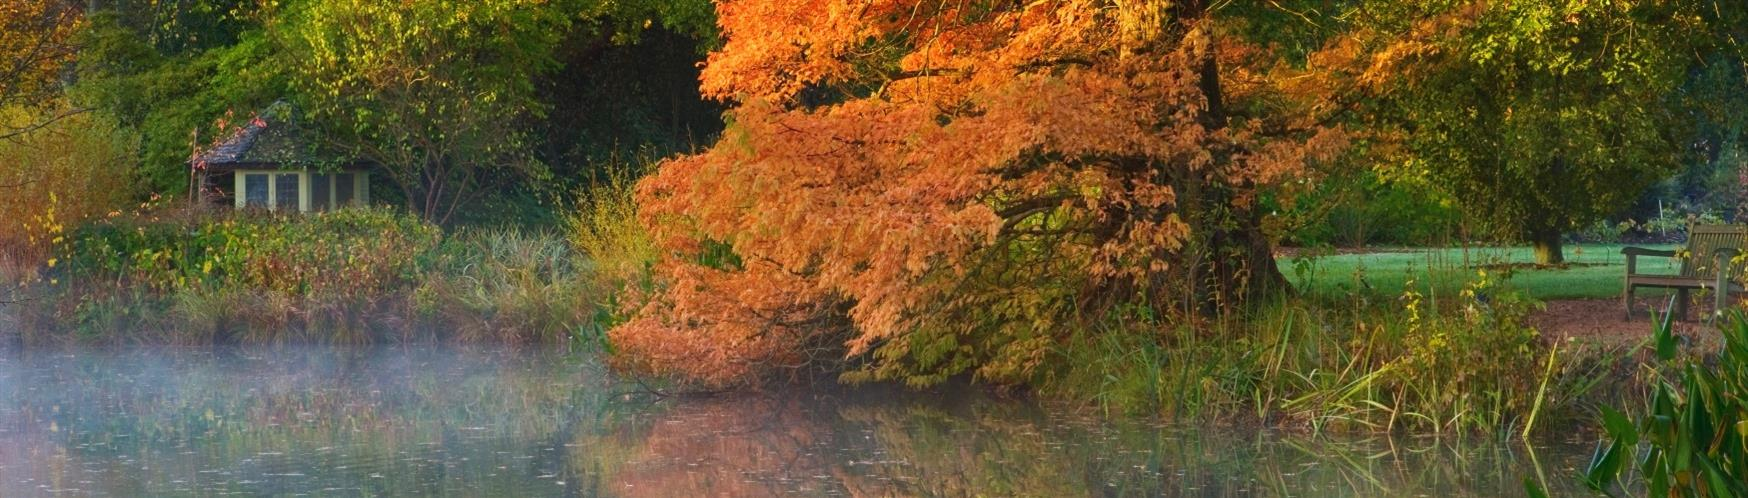 Glorious gardens to visit in Surrey - Visit Surrey